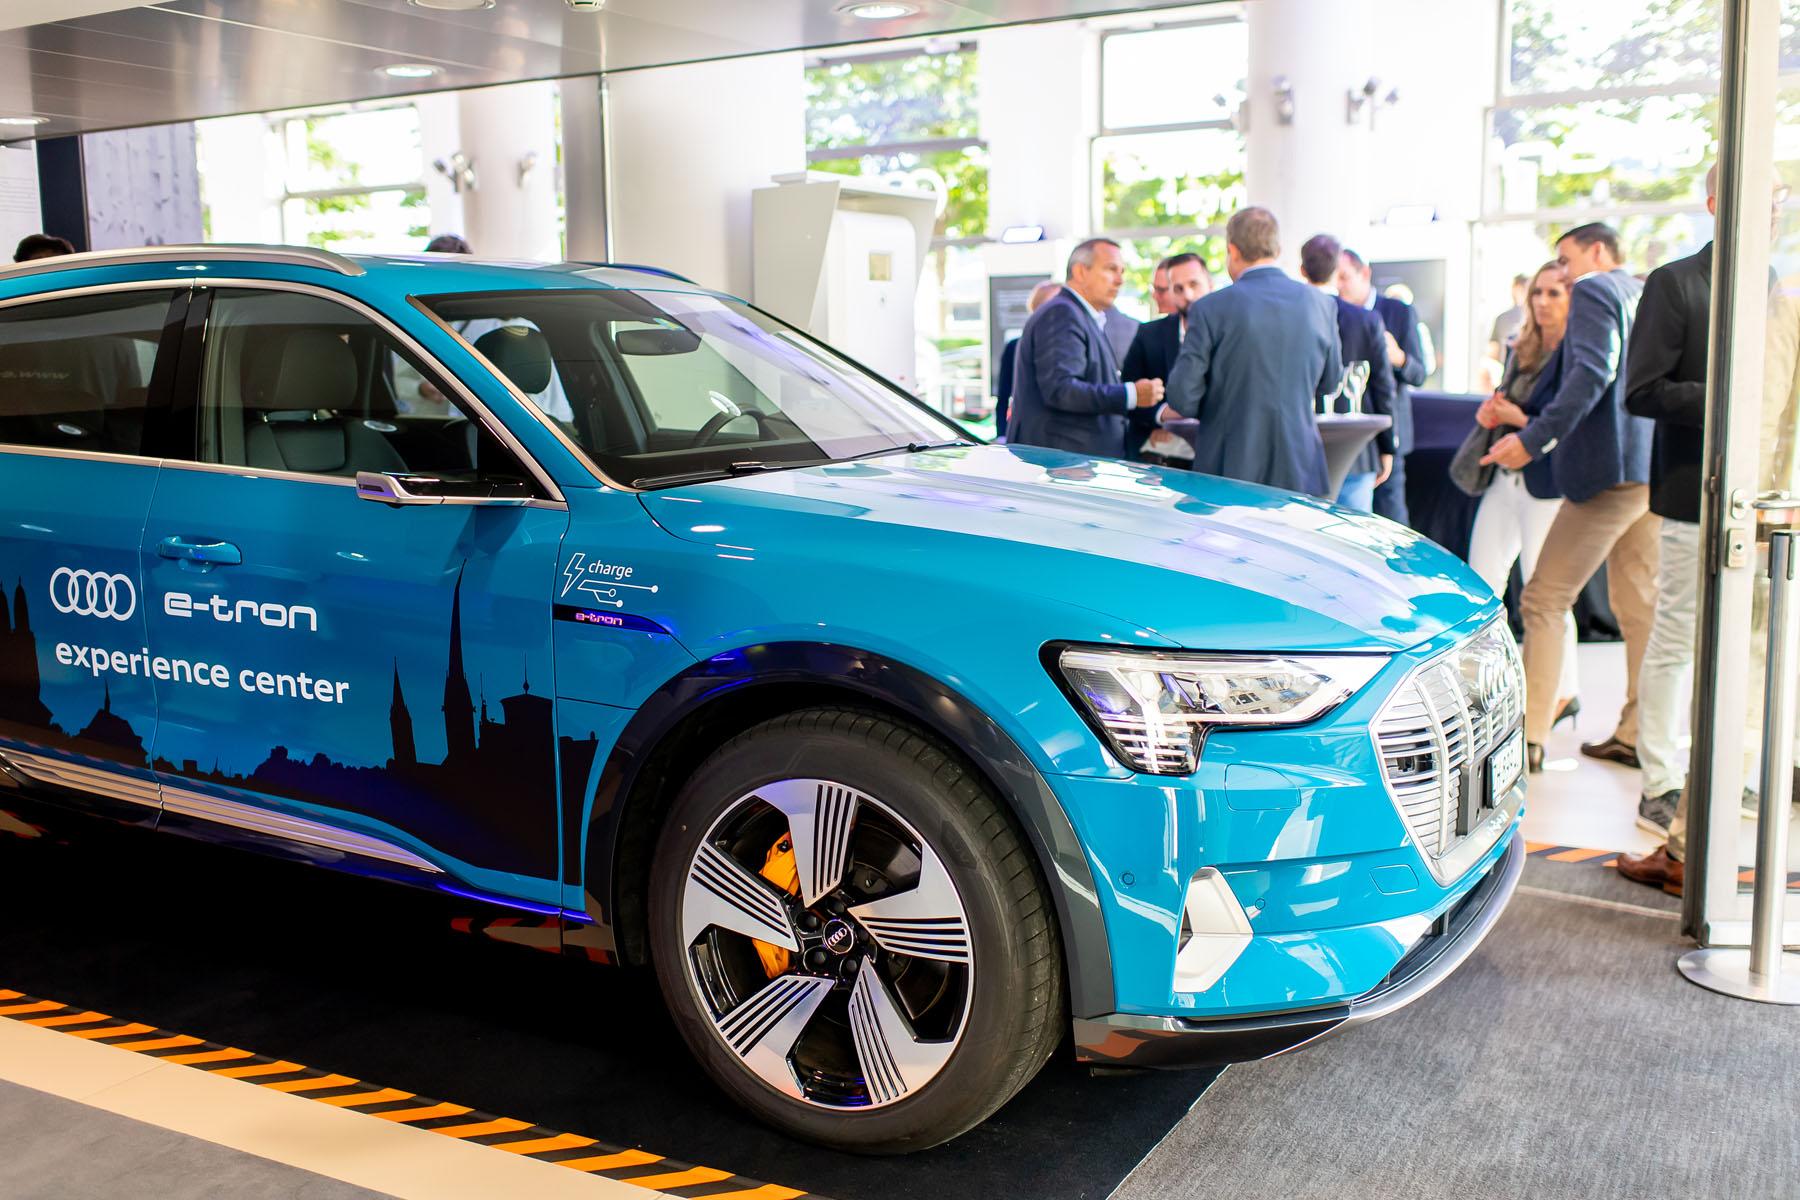 Am Utoquai ist auch ein Audi e-tron stationiert. (Tom Lüthi)